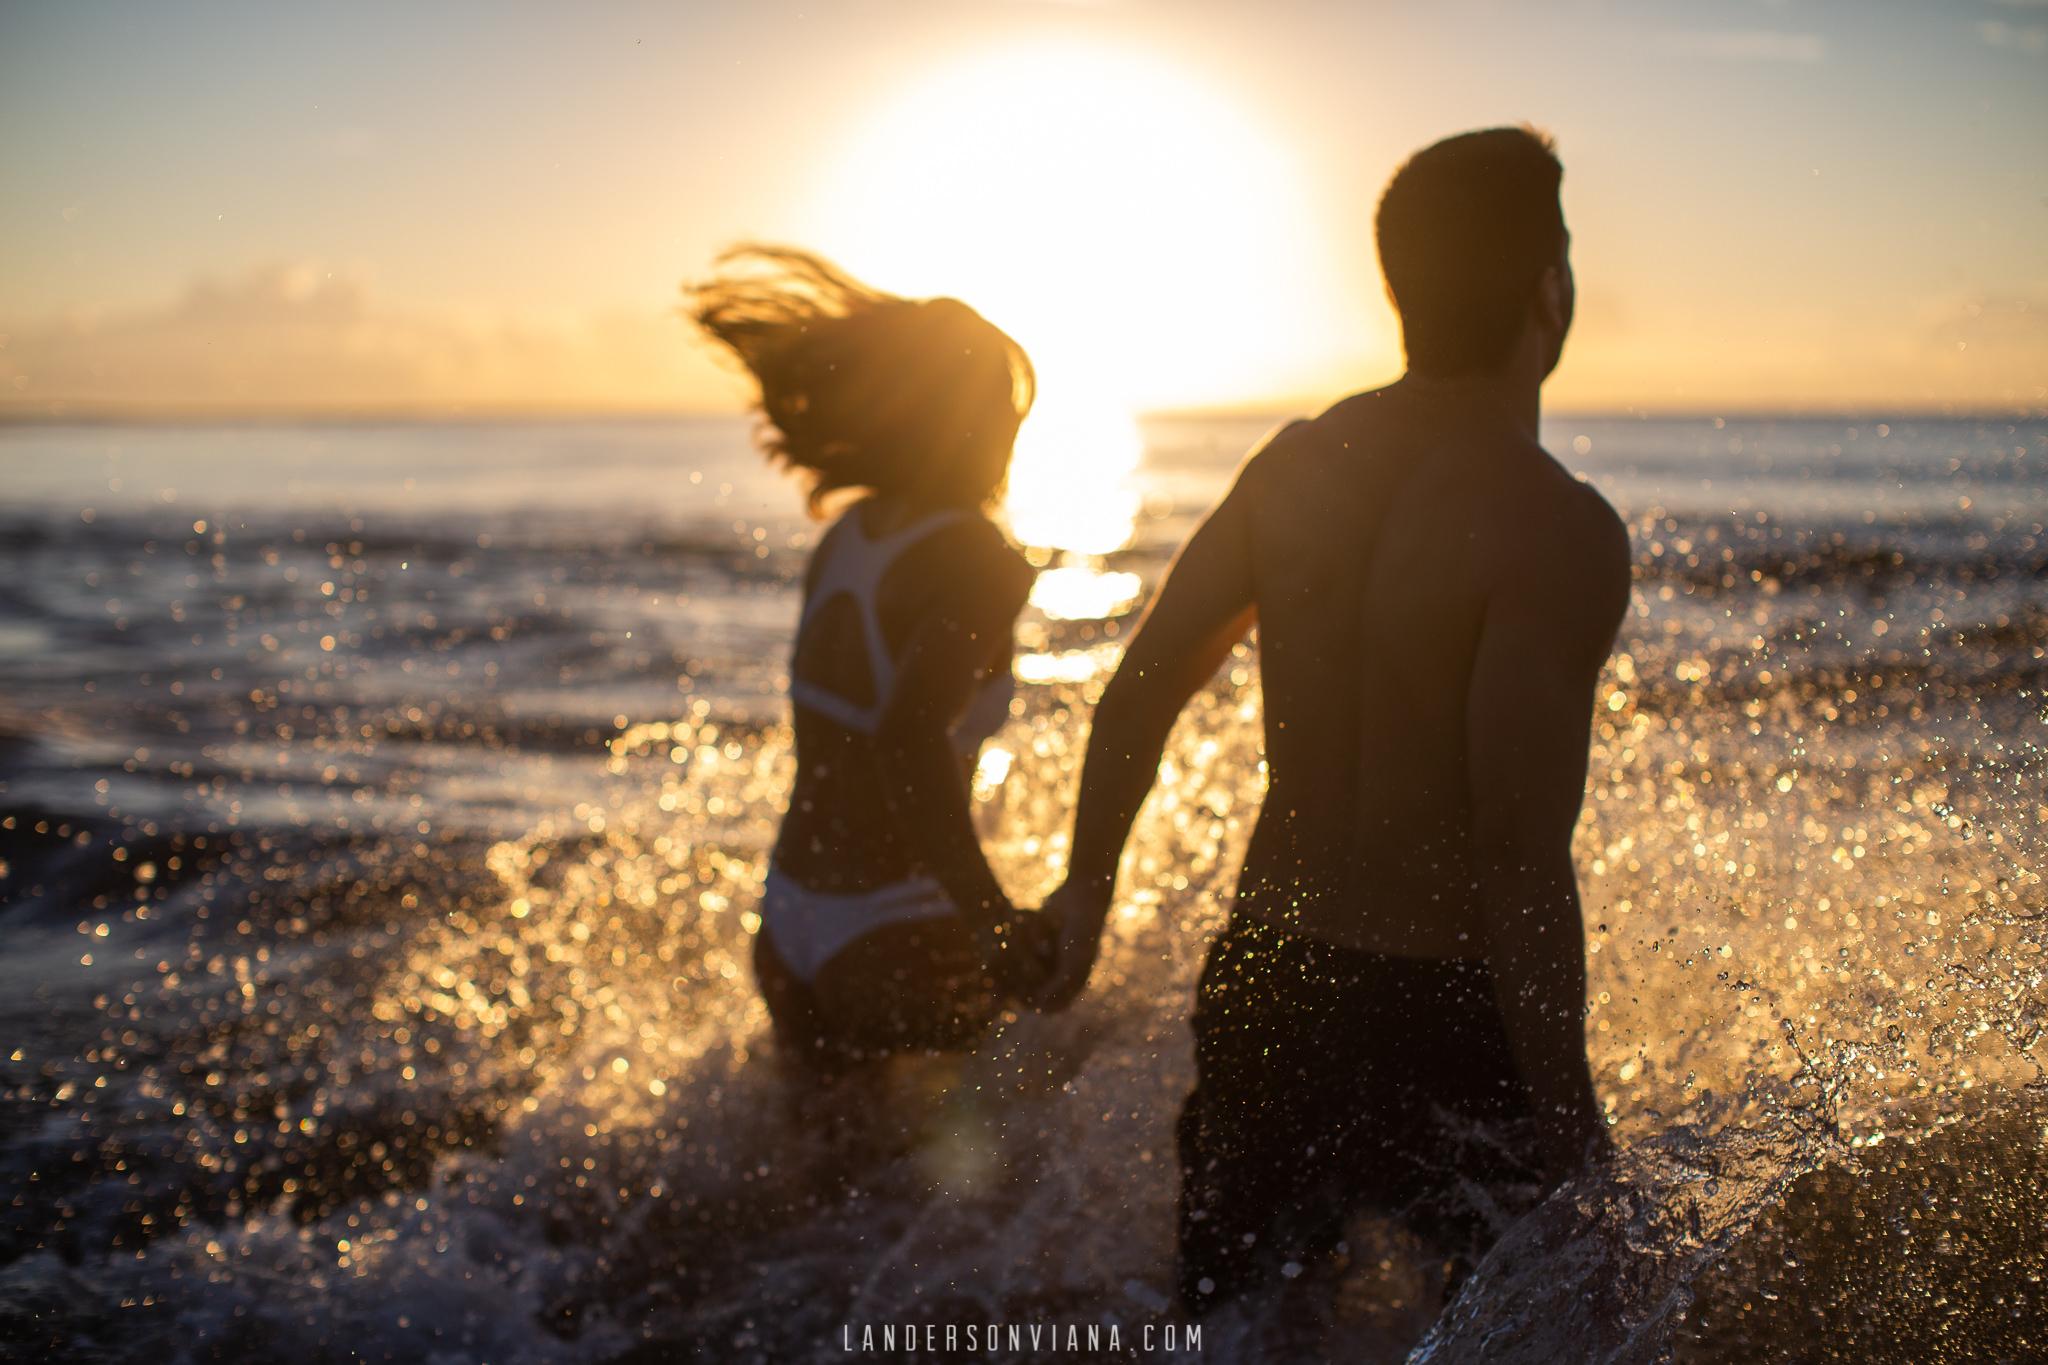 ensaio-pre-wedding-praia-landerson-viana-fotografia-casamento-pegueiobouquet-73.jpg